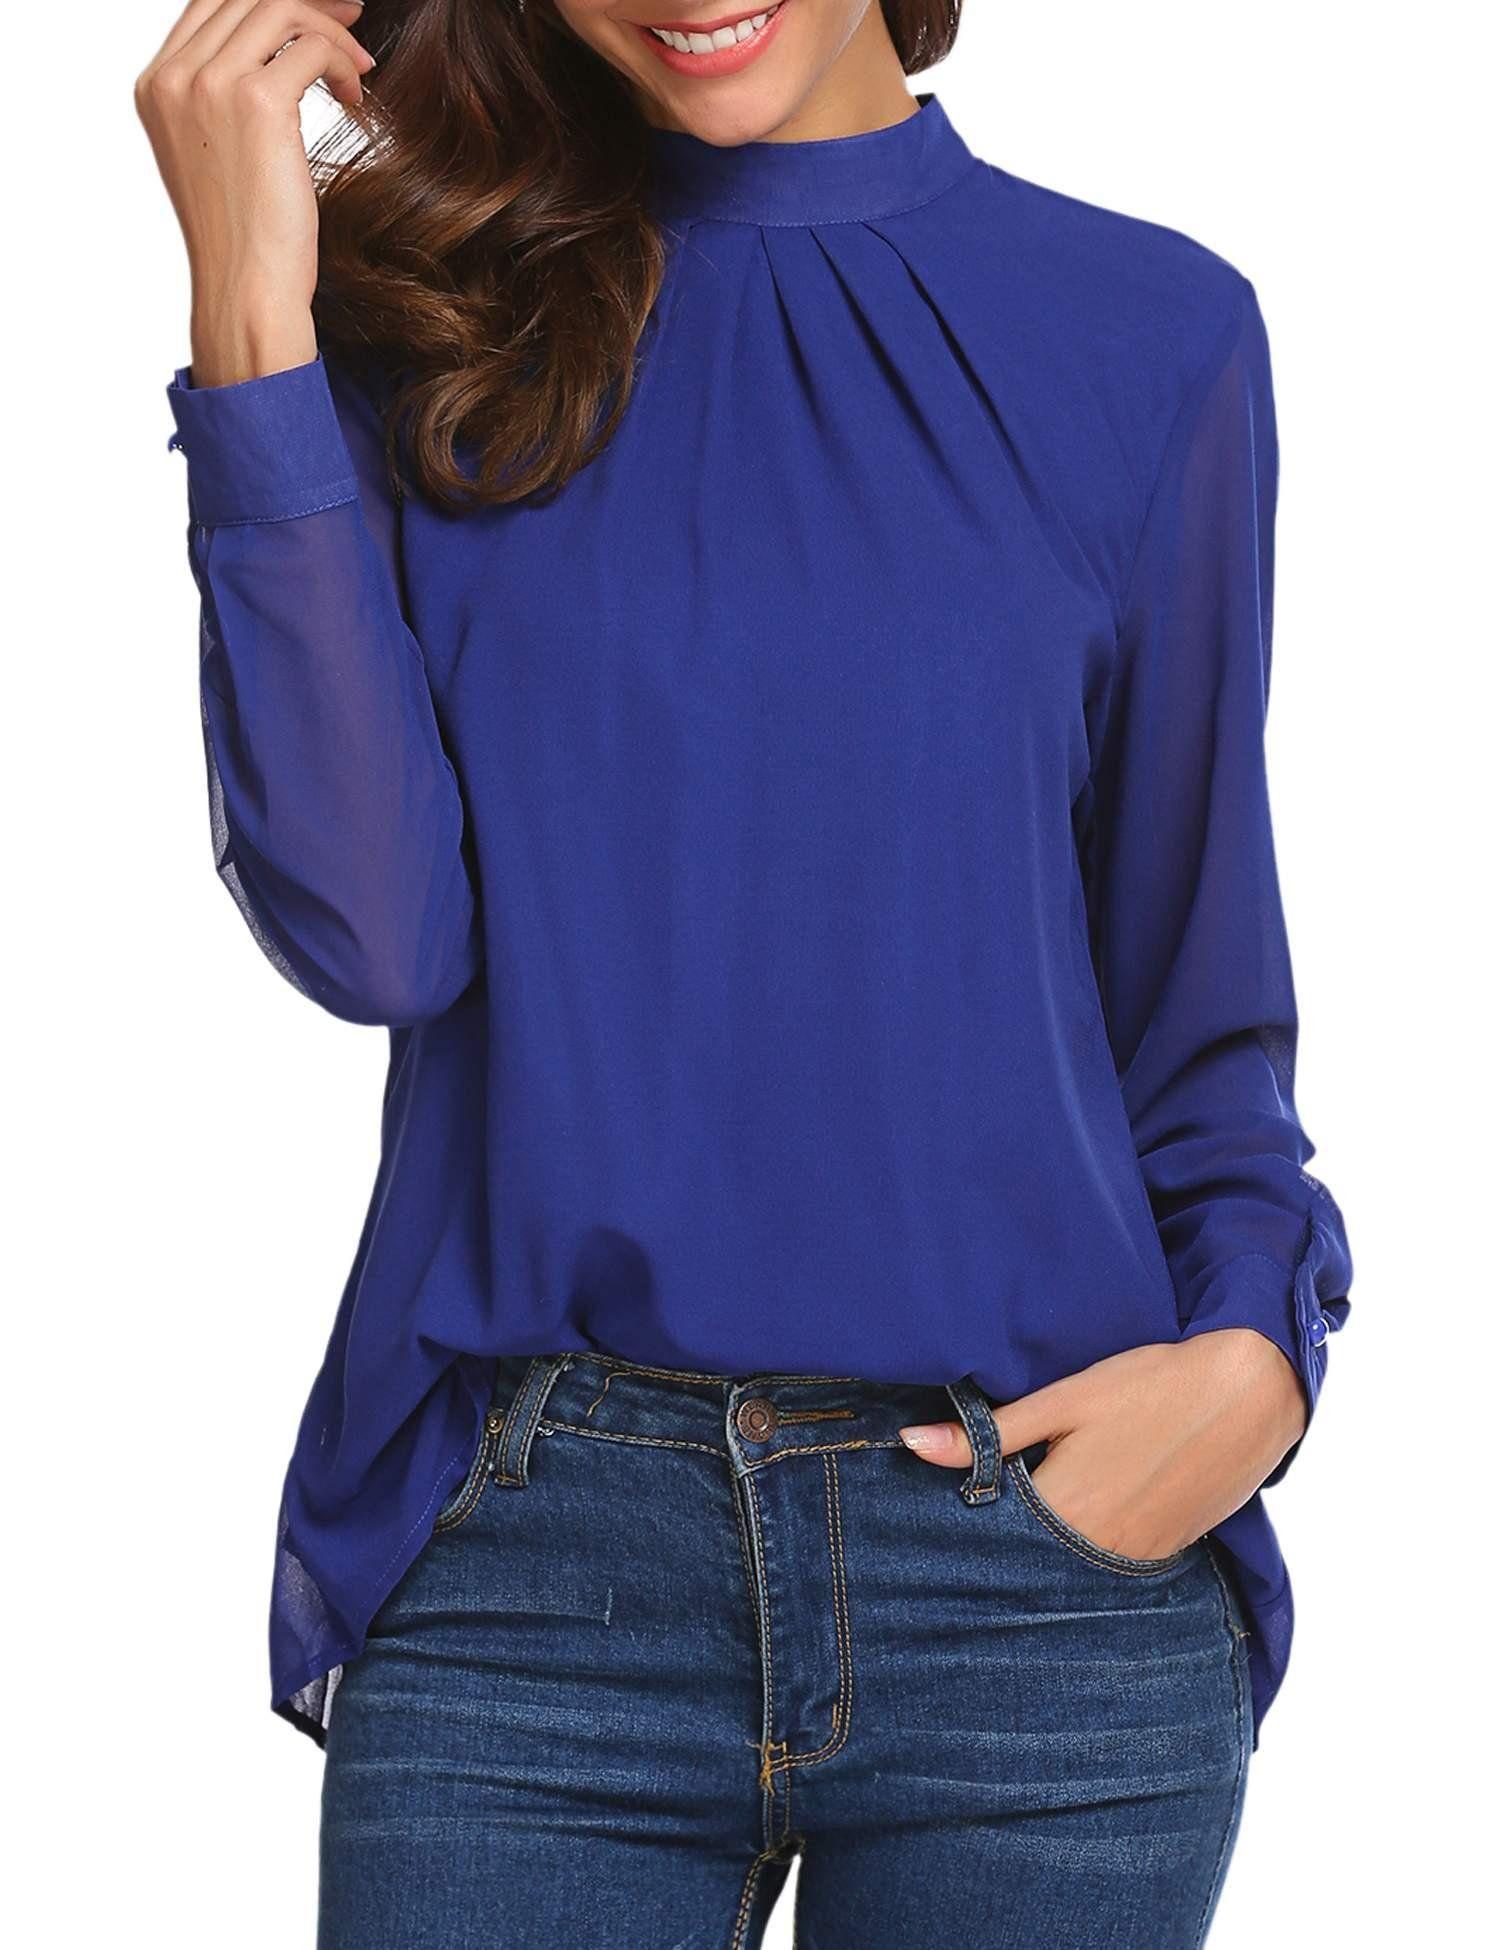 0bda4886a8 Cosbeauty Women Loose Chiffon Tops Blouse Casual Long Sleeve Pleated Tshirt  royal blue size M -